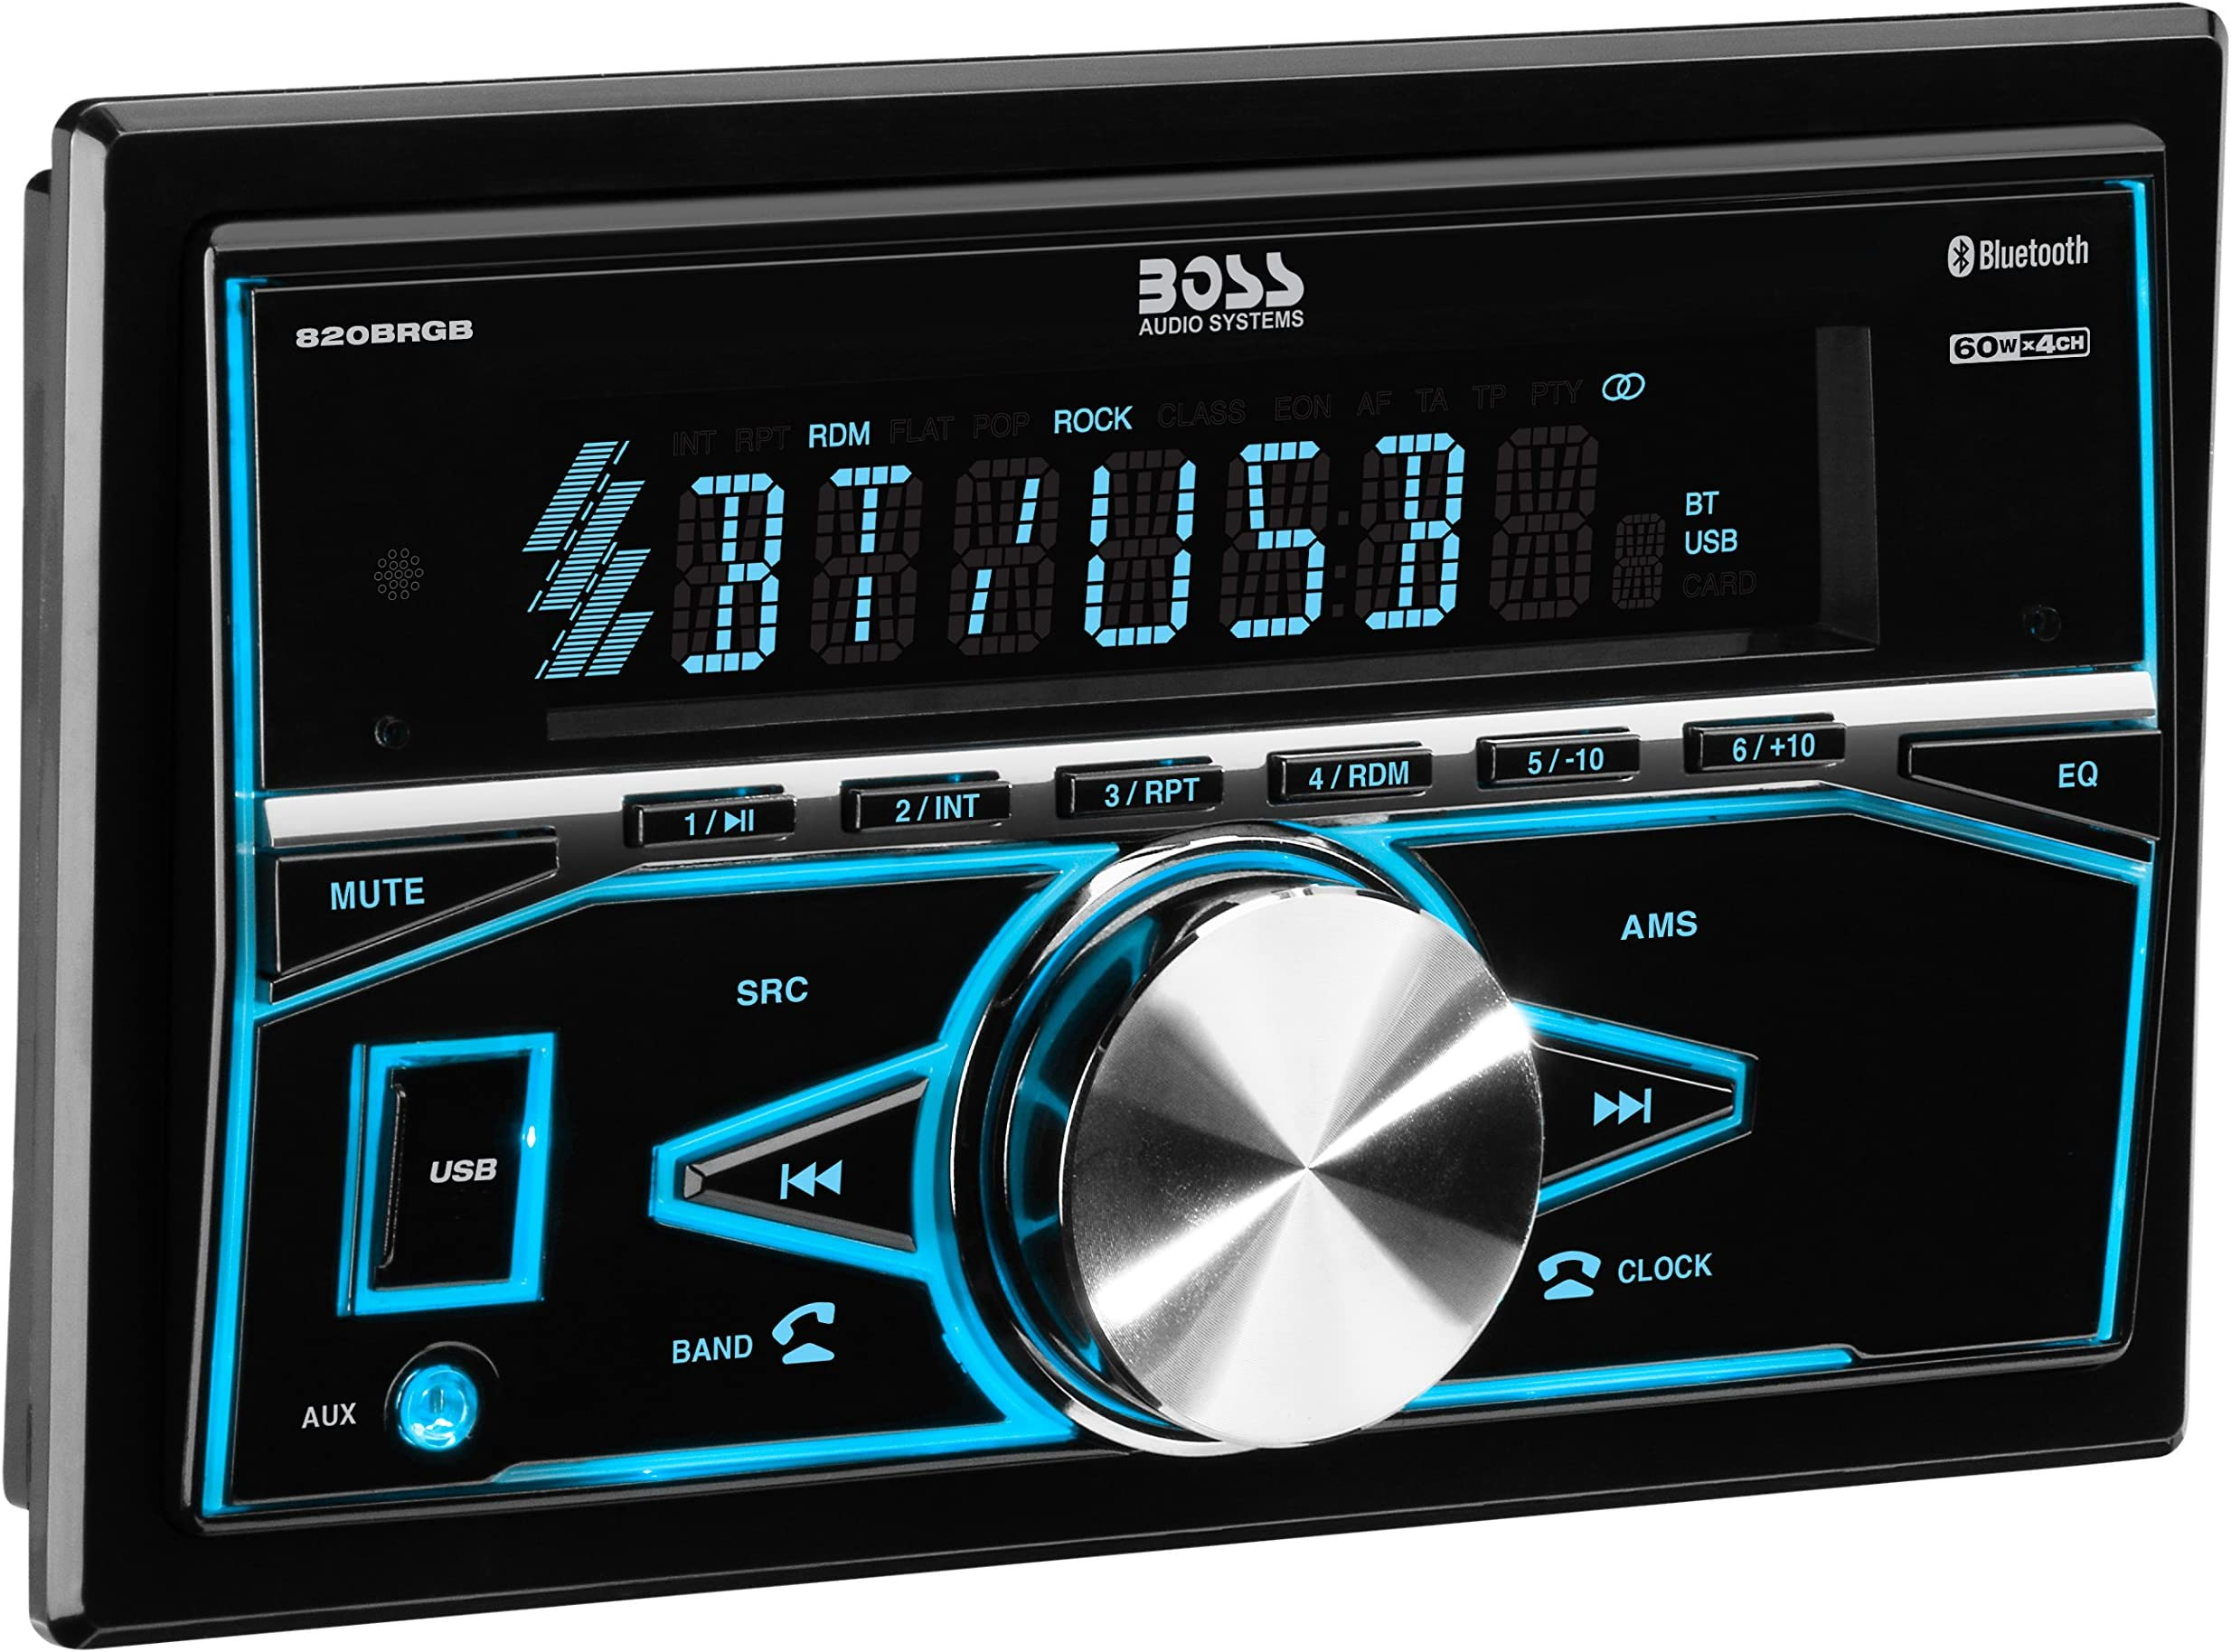 Bose Car Stereo >> Bose Car Audio Lcd Wiring Wiring Diagram Show